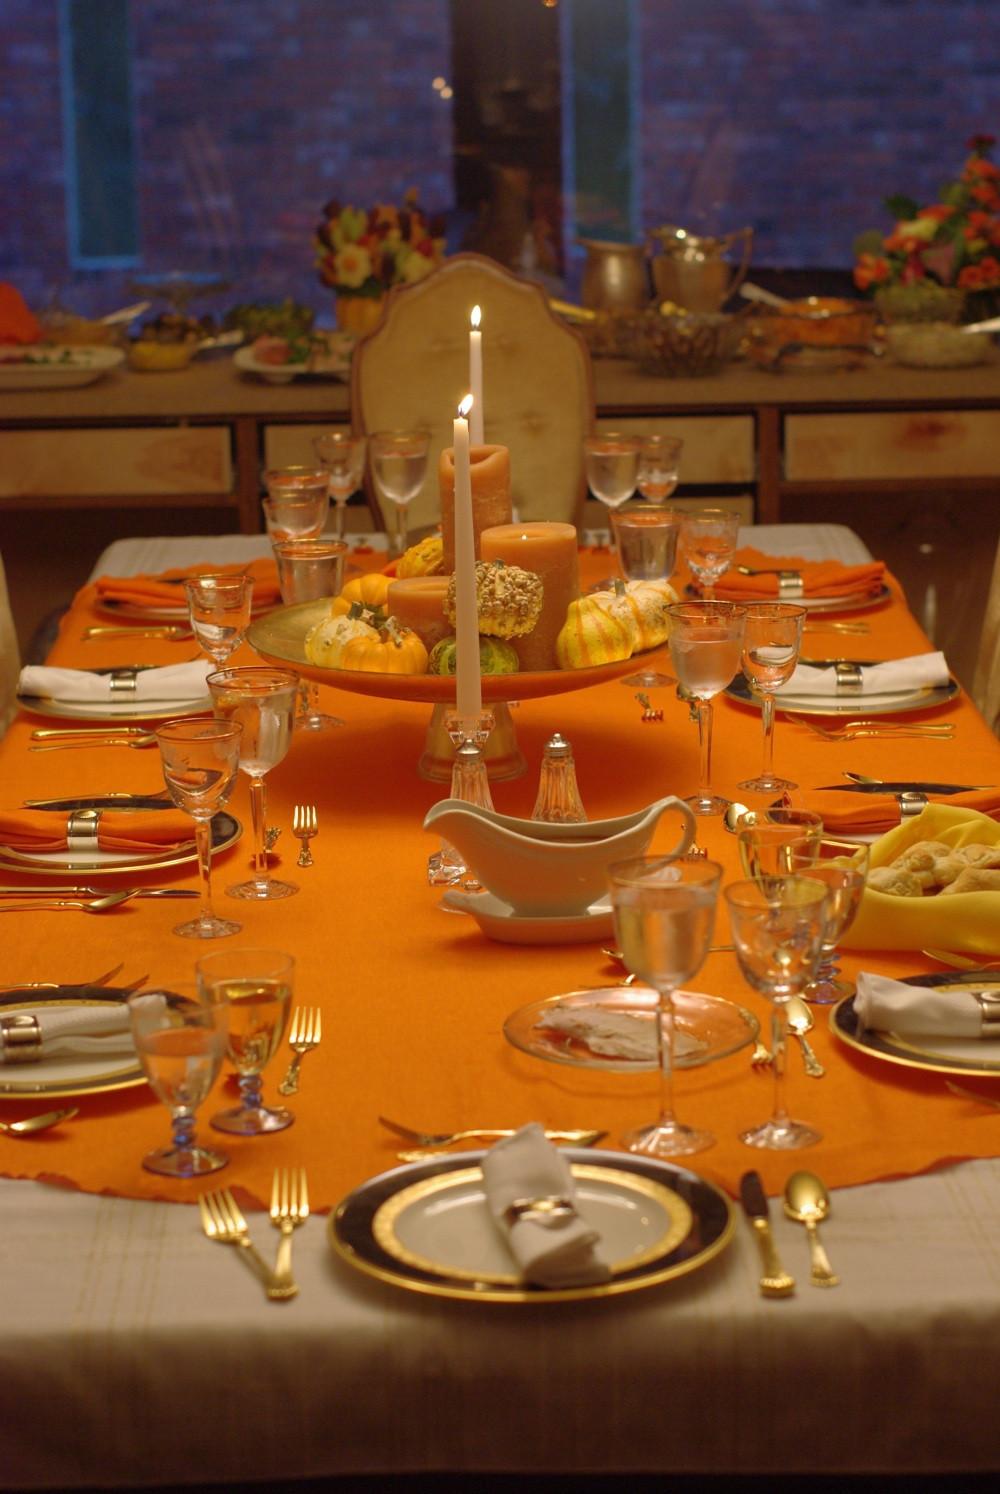 Thanksgiving Dinner Table Decorations  5 Harvest Themed Thanksgiving Tables